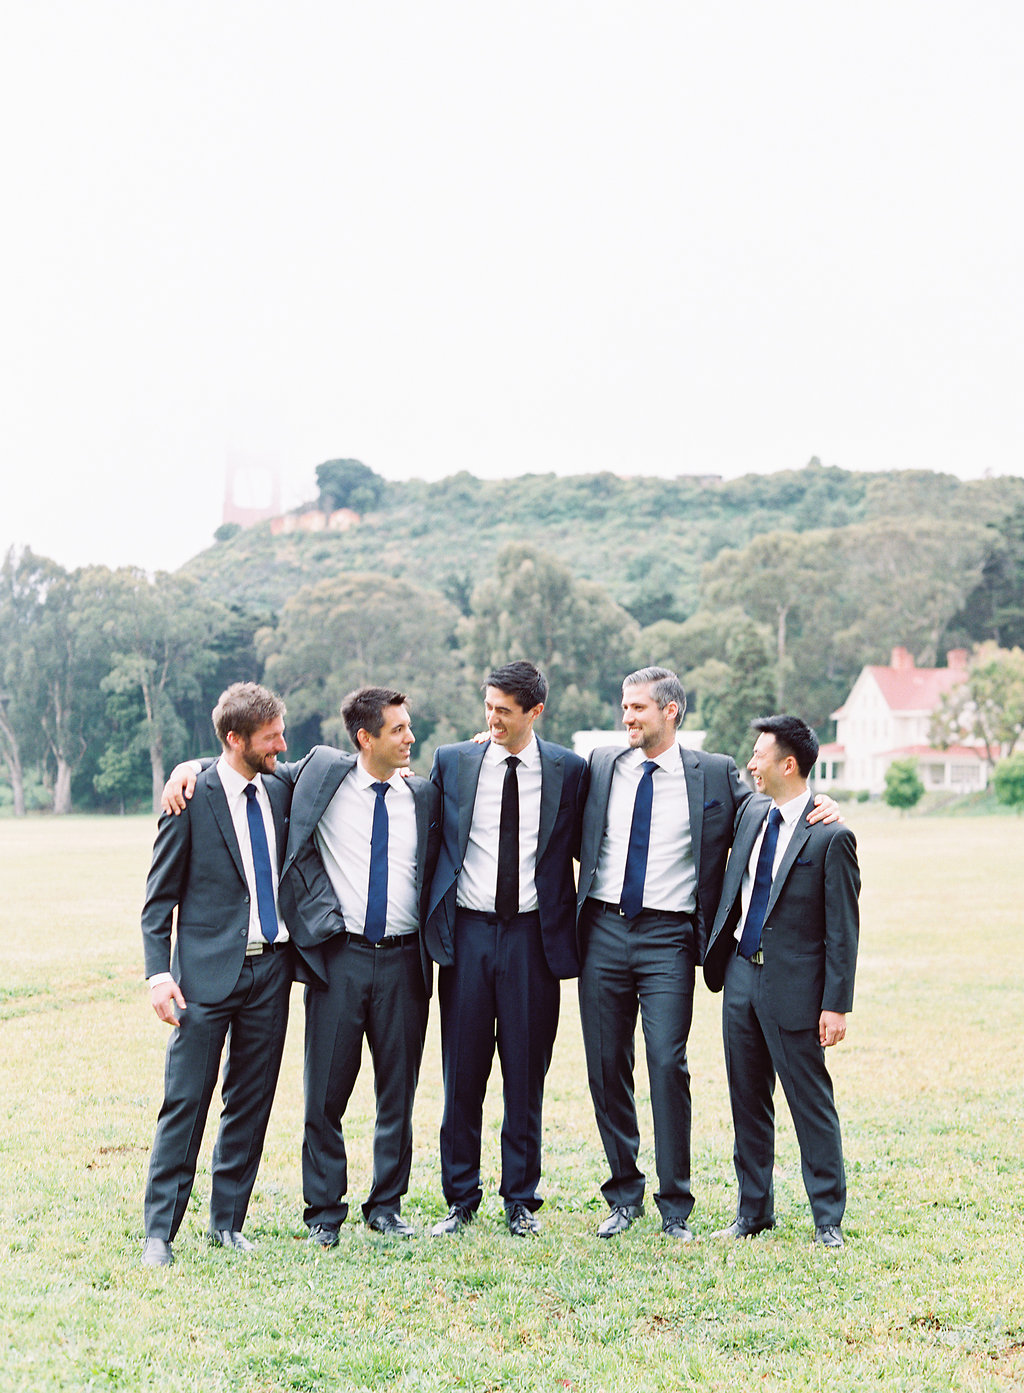 Cavallo-Point-Wedding-San-Francisco- Film-Photographer-159.jpg